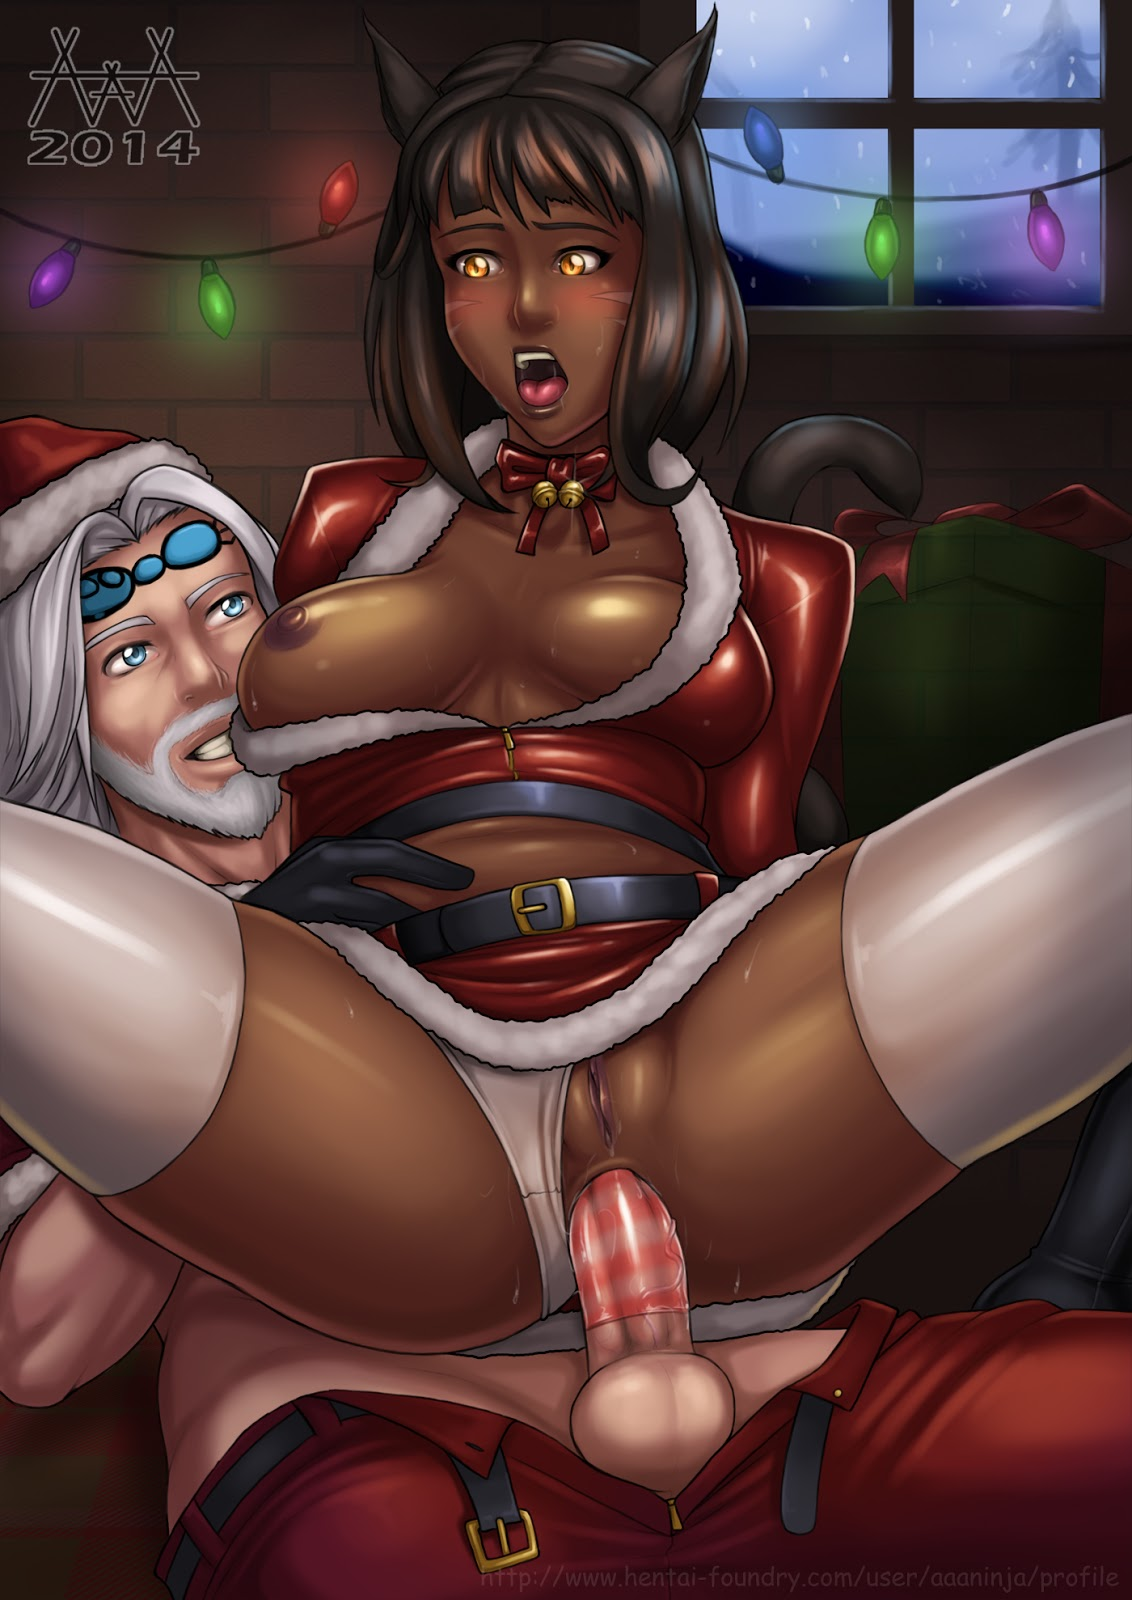 xiv nude fantasy final patch Fairy tail lucy heartfilia hentai